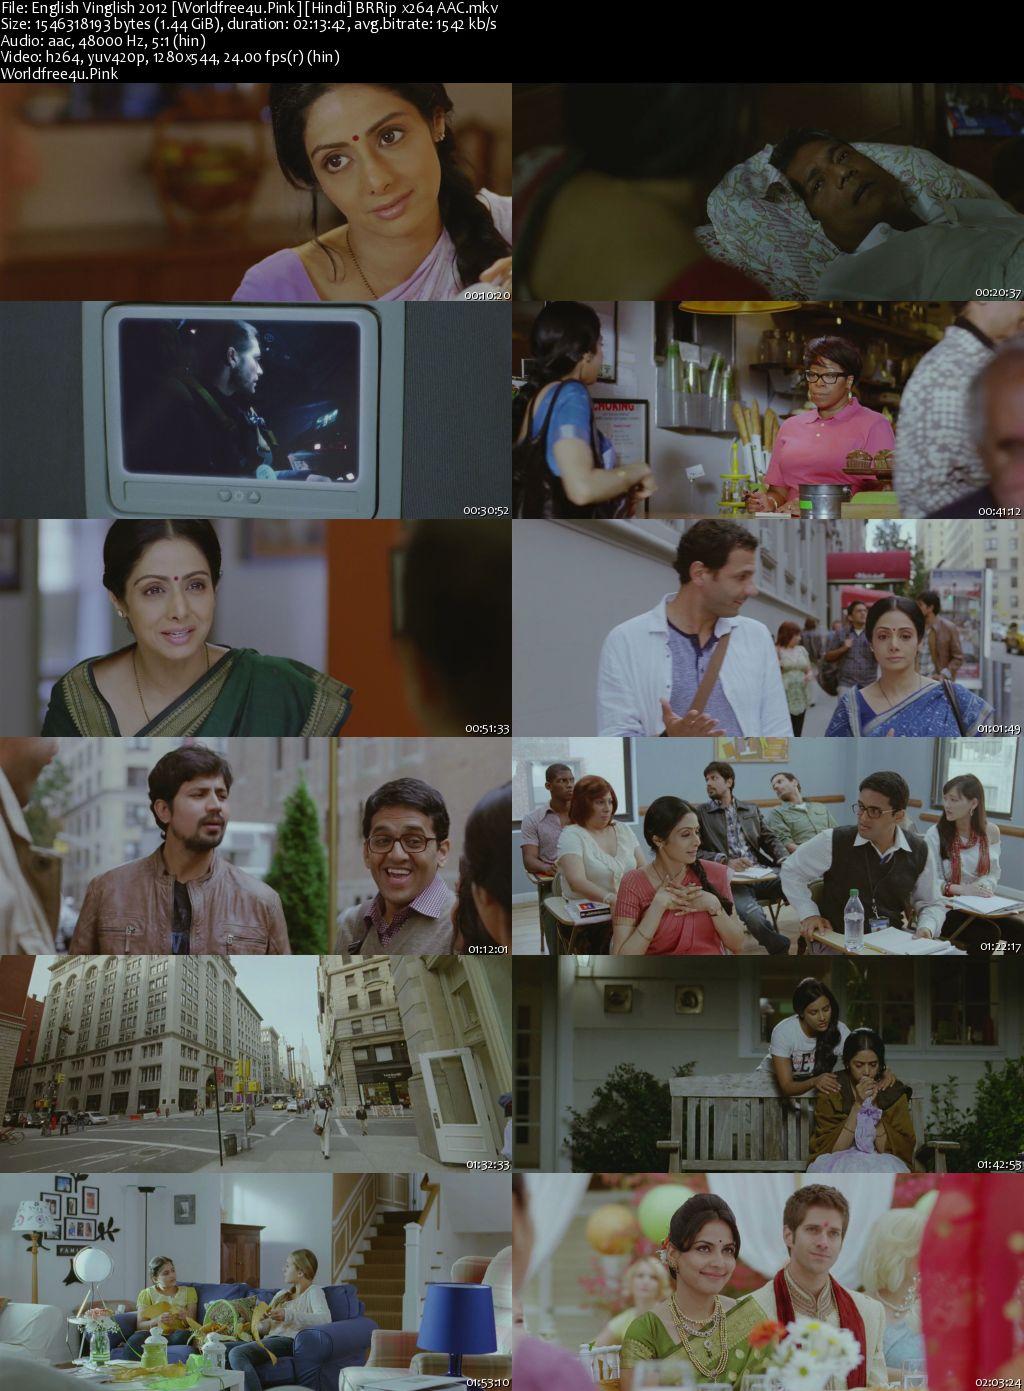 English Vinglish 2012 Hindi BRRip 720p